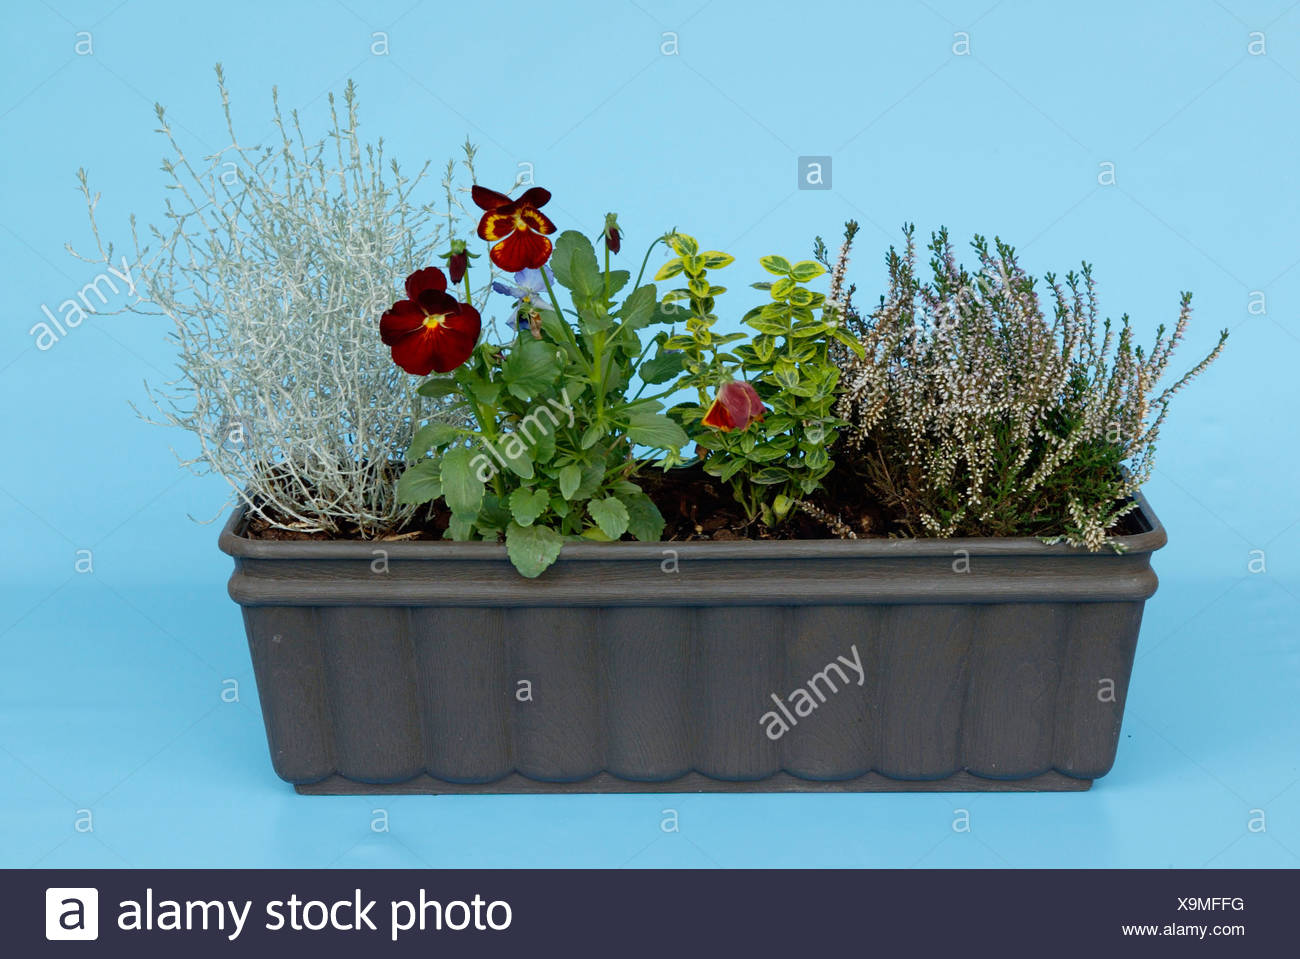 Window Box with flowers / Bepflanzter Blumenkasten - Stock Image